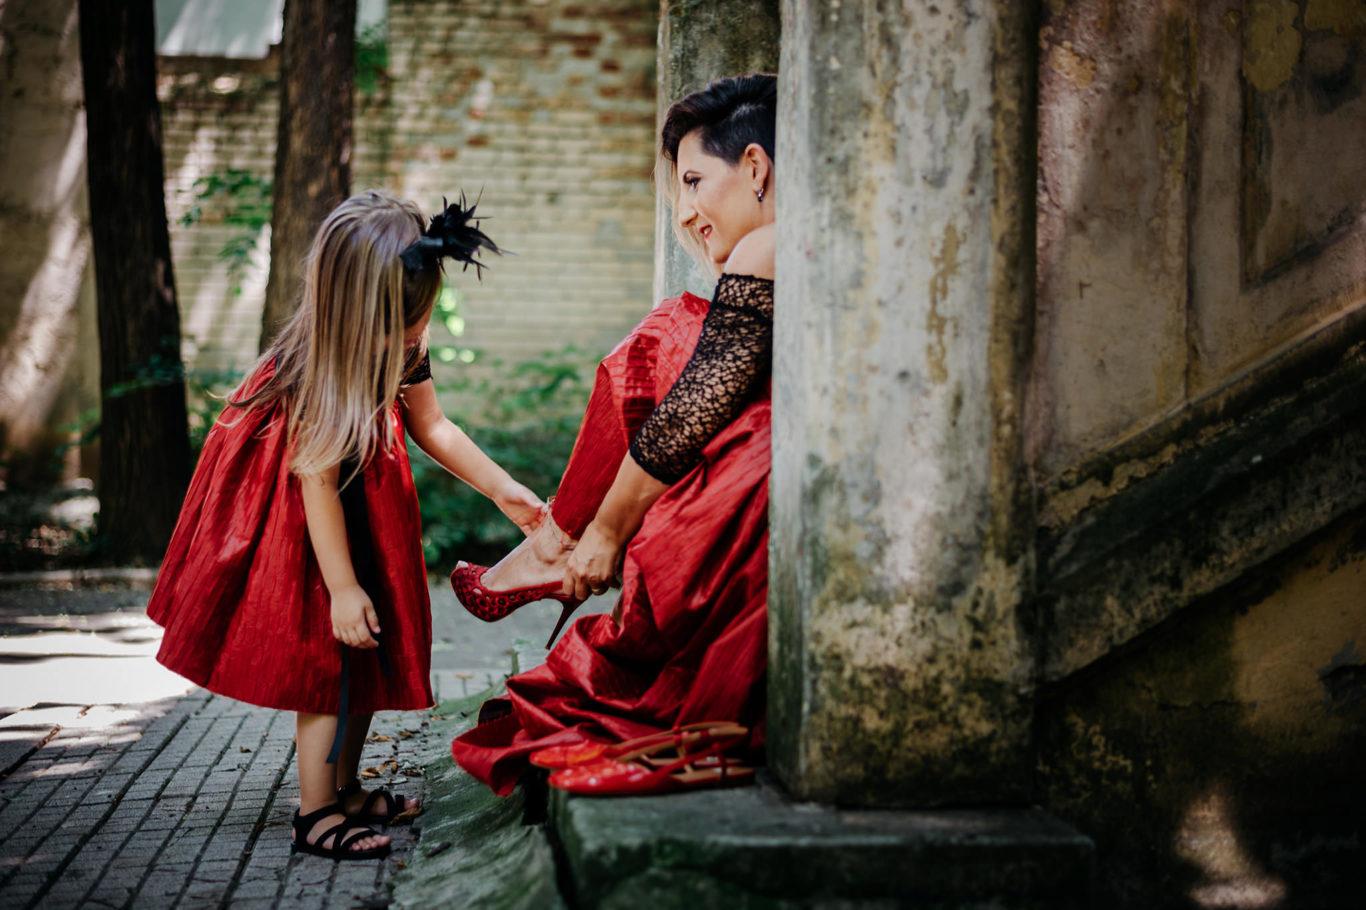 0277-fotografie-nunta-bucuresti-anca-george-fotograf-ciprian-dumitrescu-dsc_8310